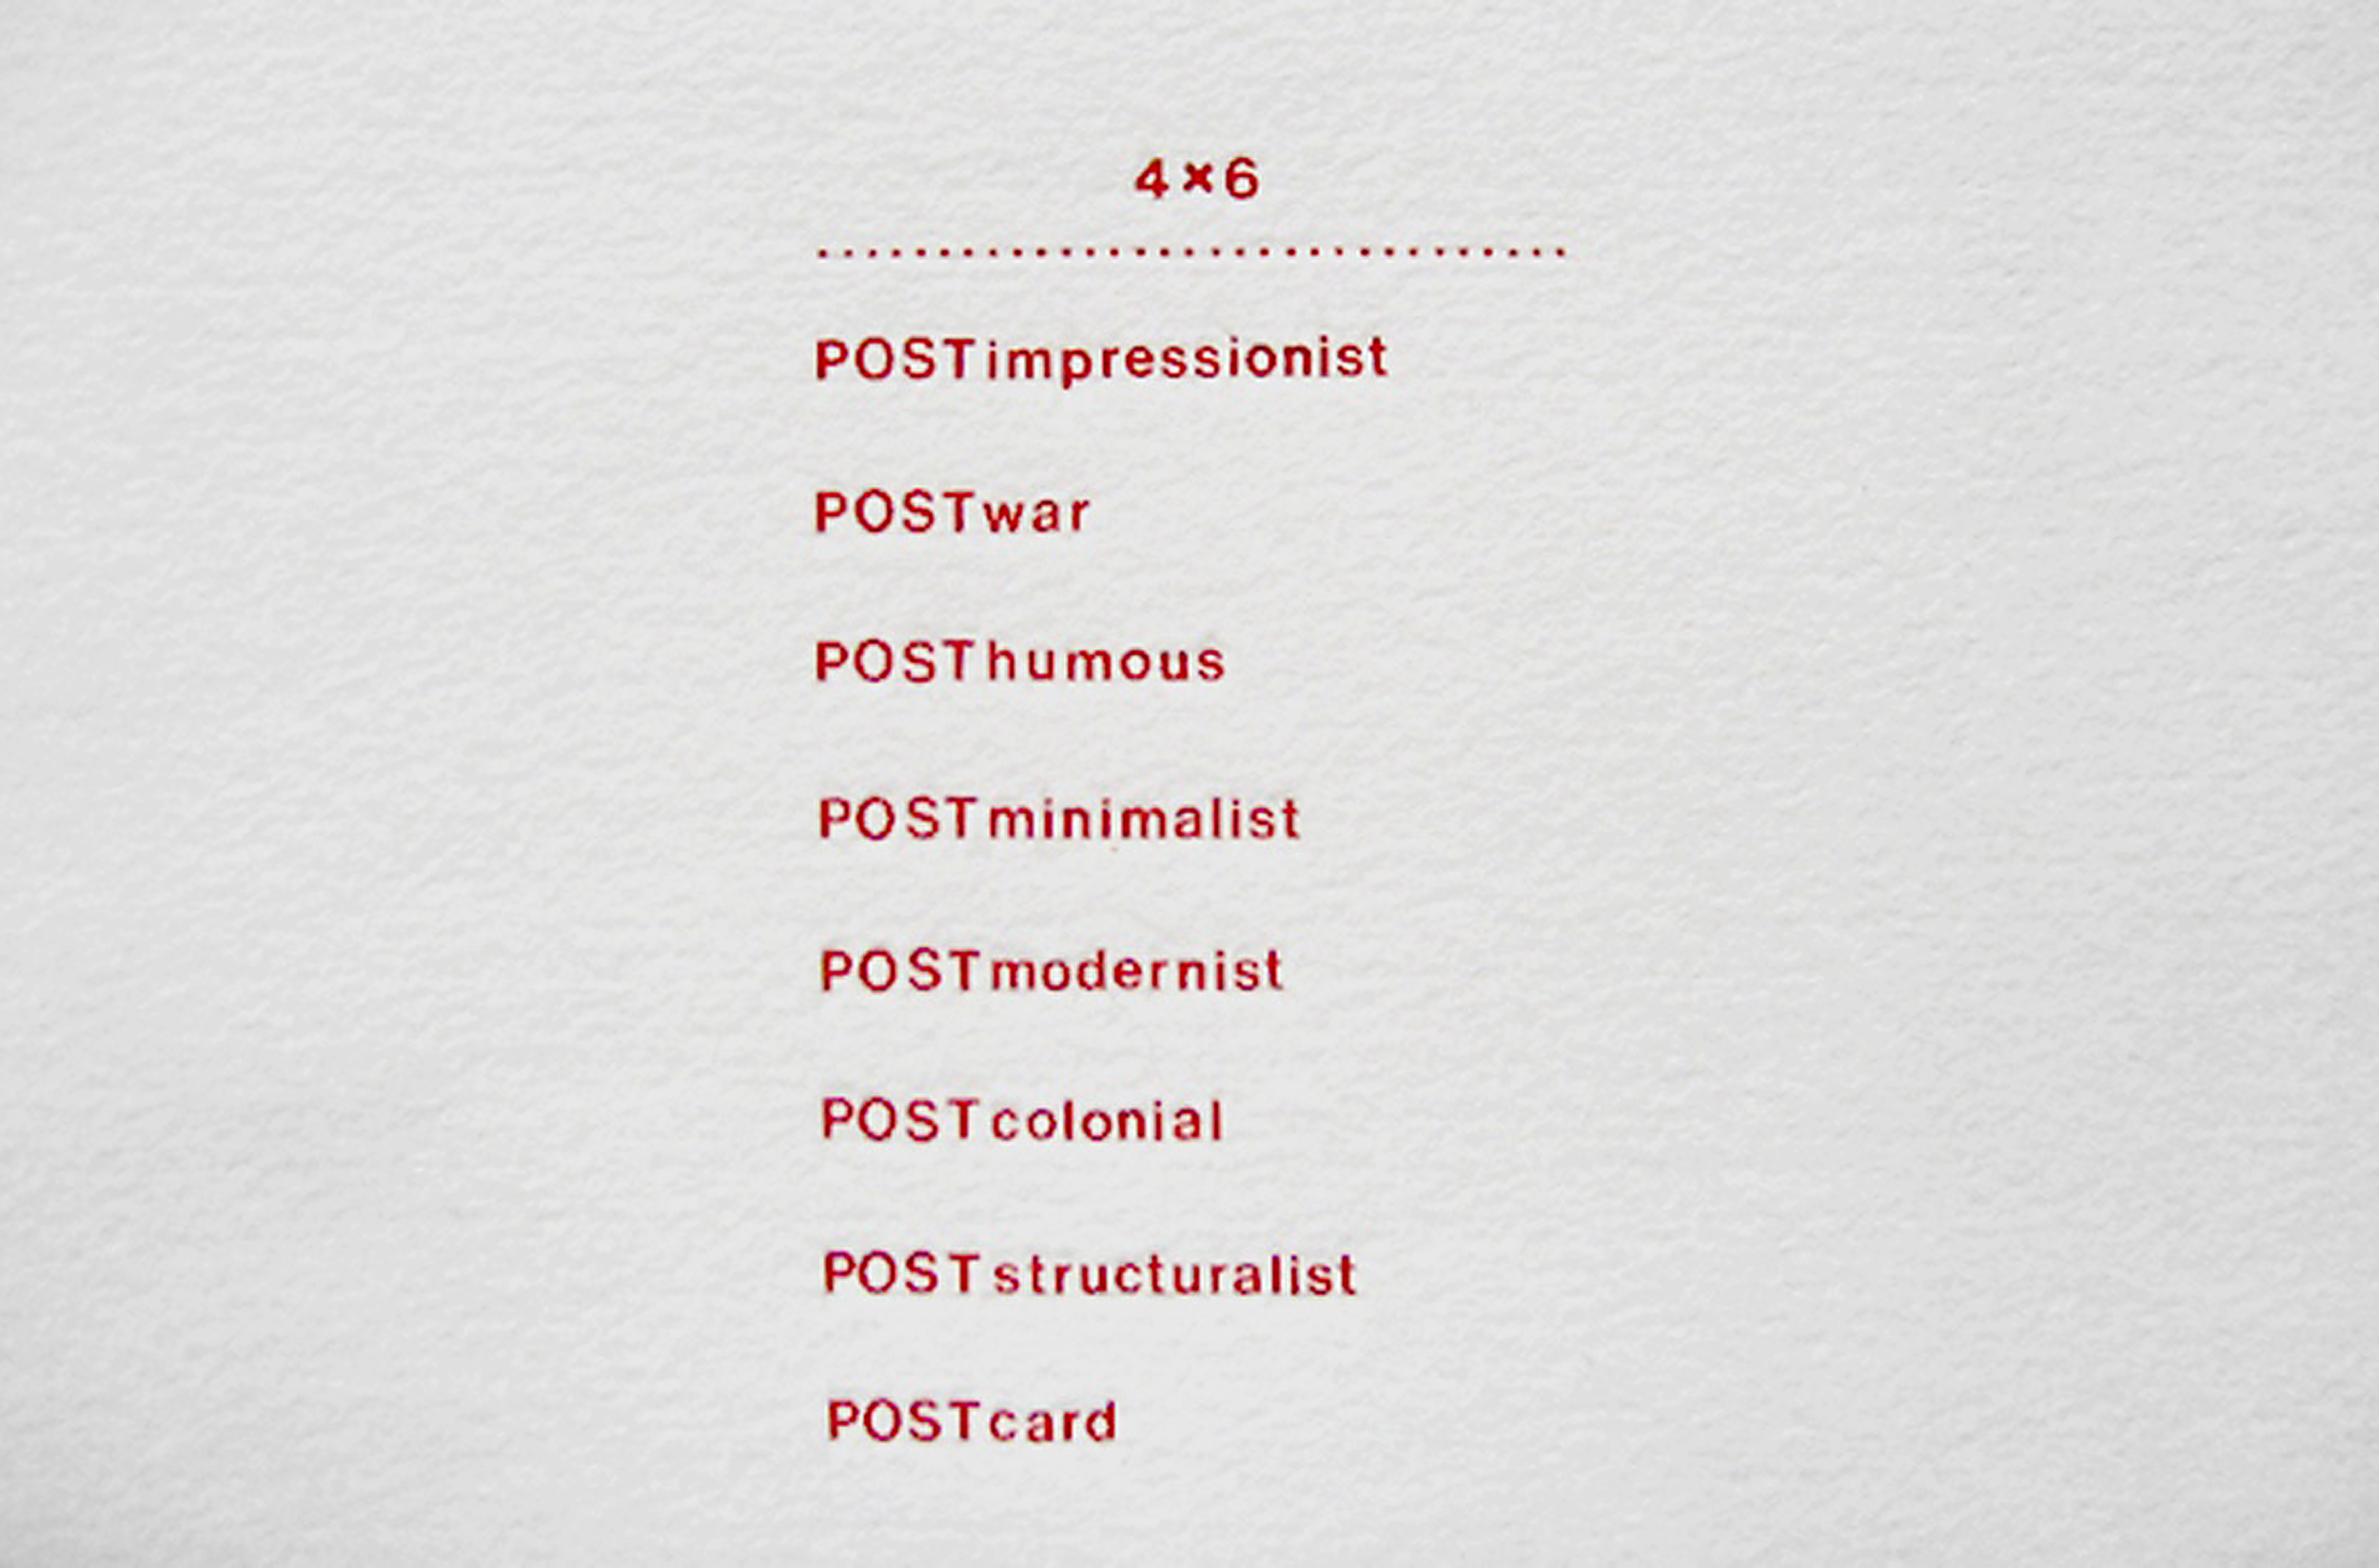 4x6 postcard .jpg